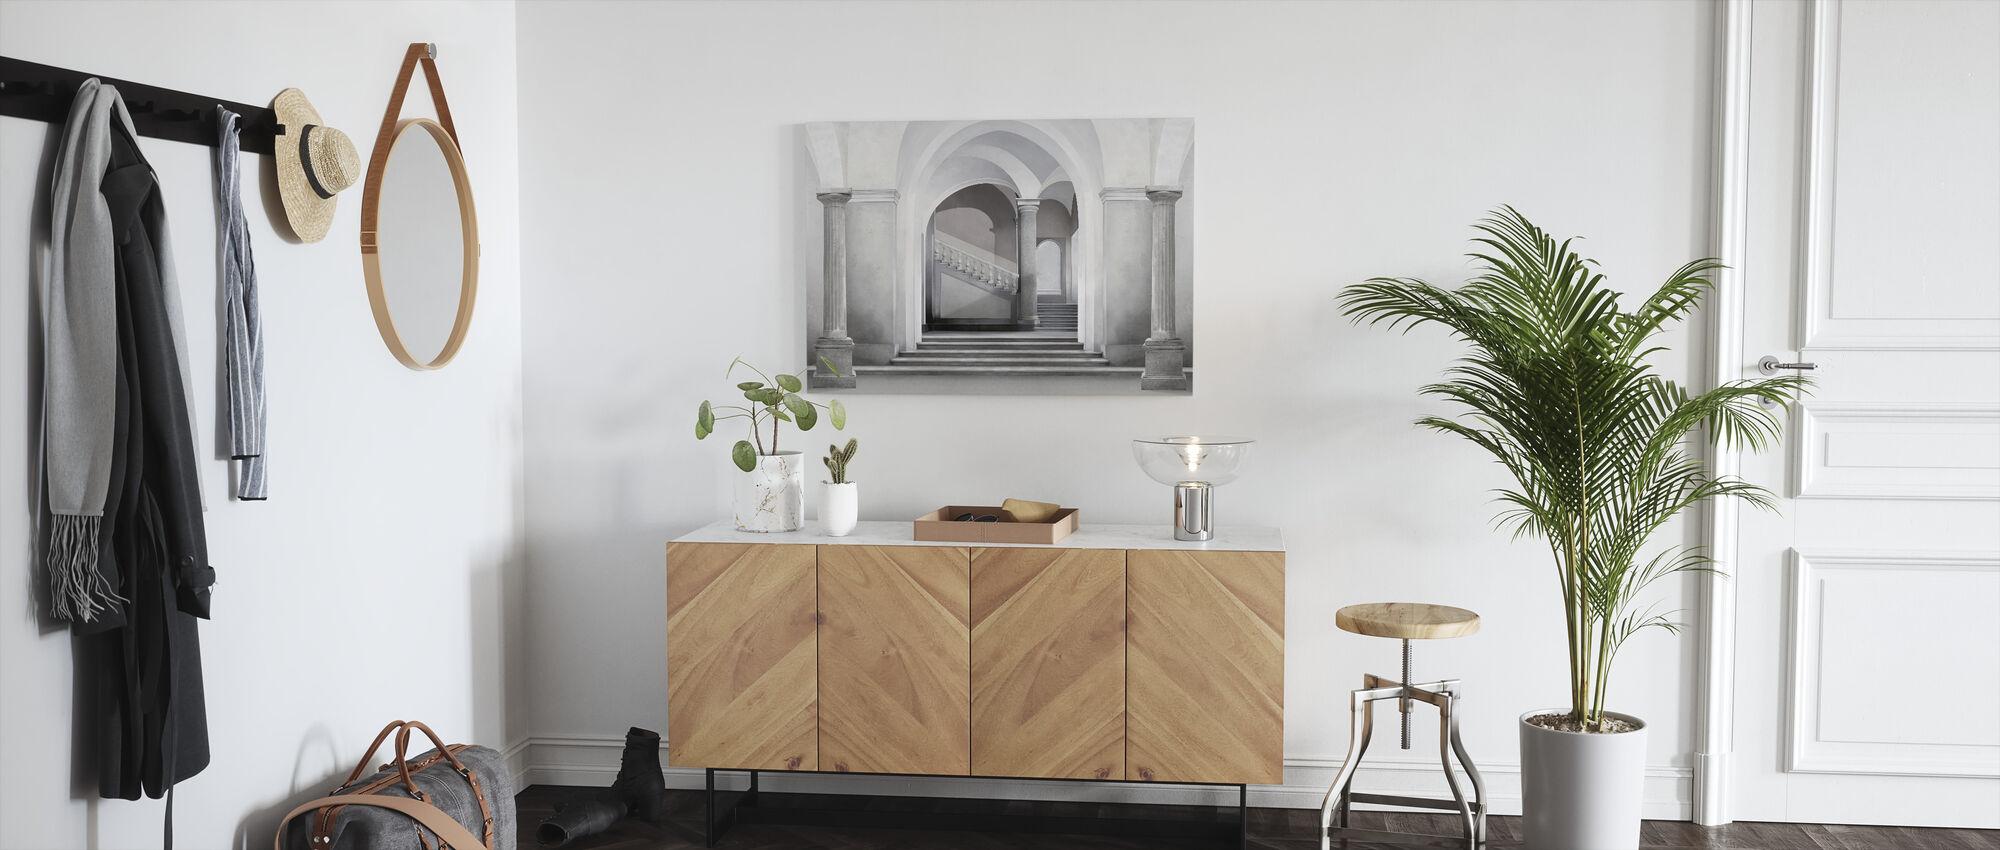 Arches Entrance - Canvas print - Hallway